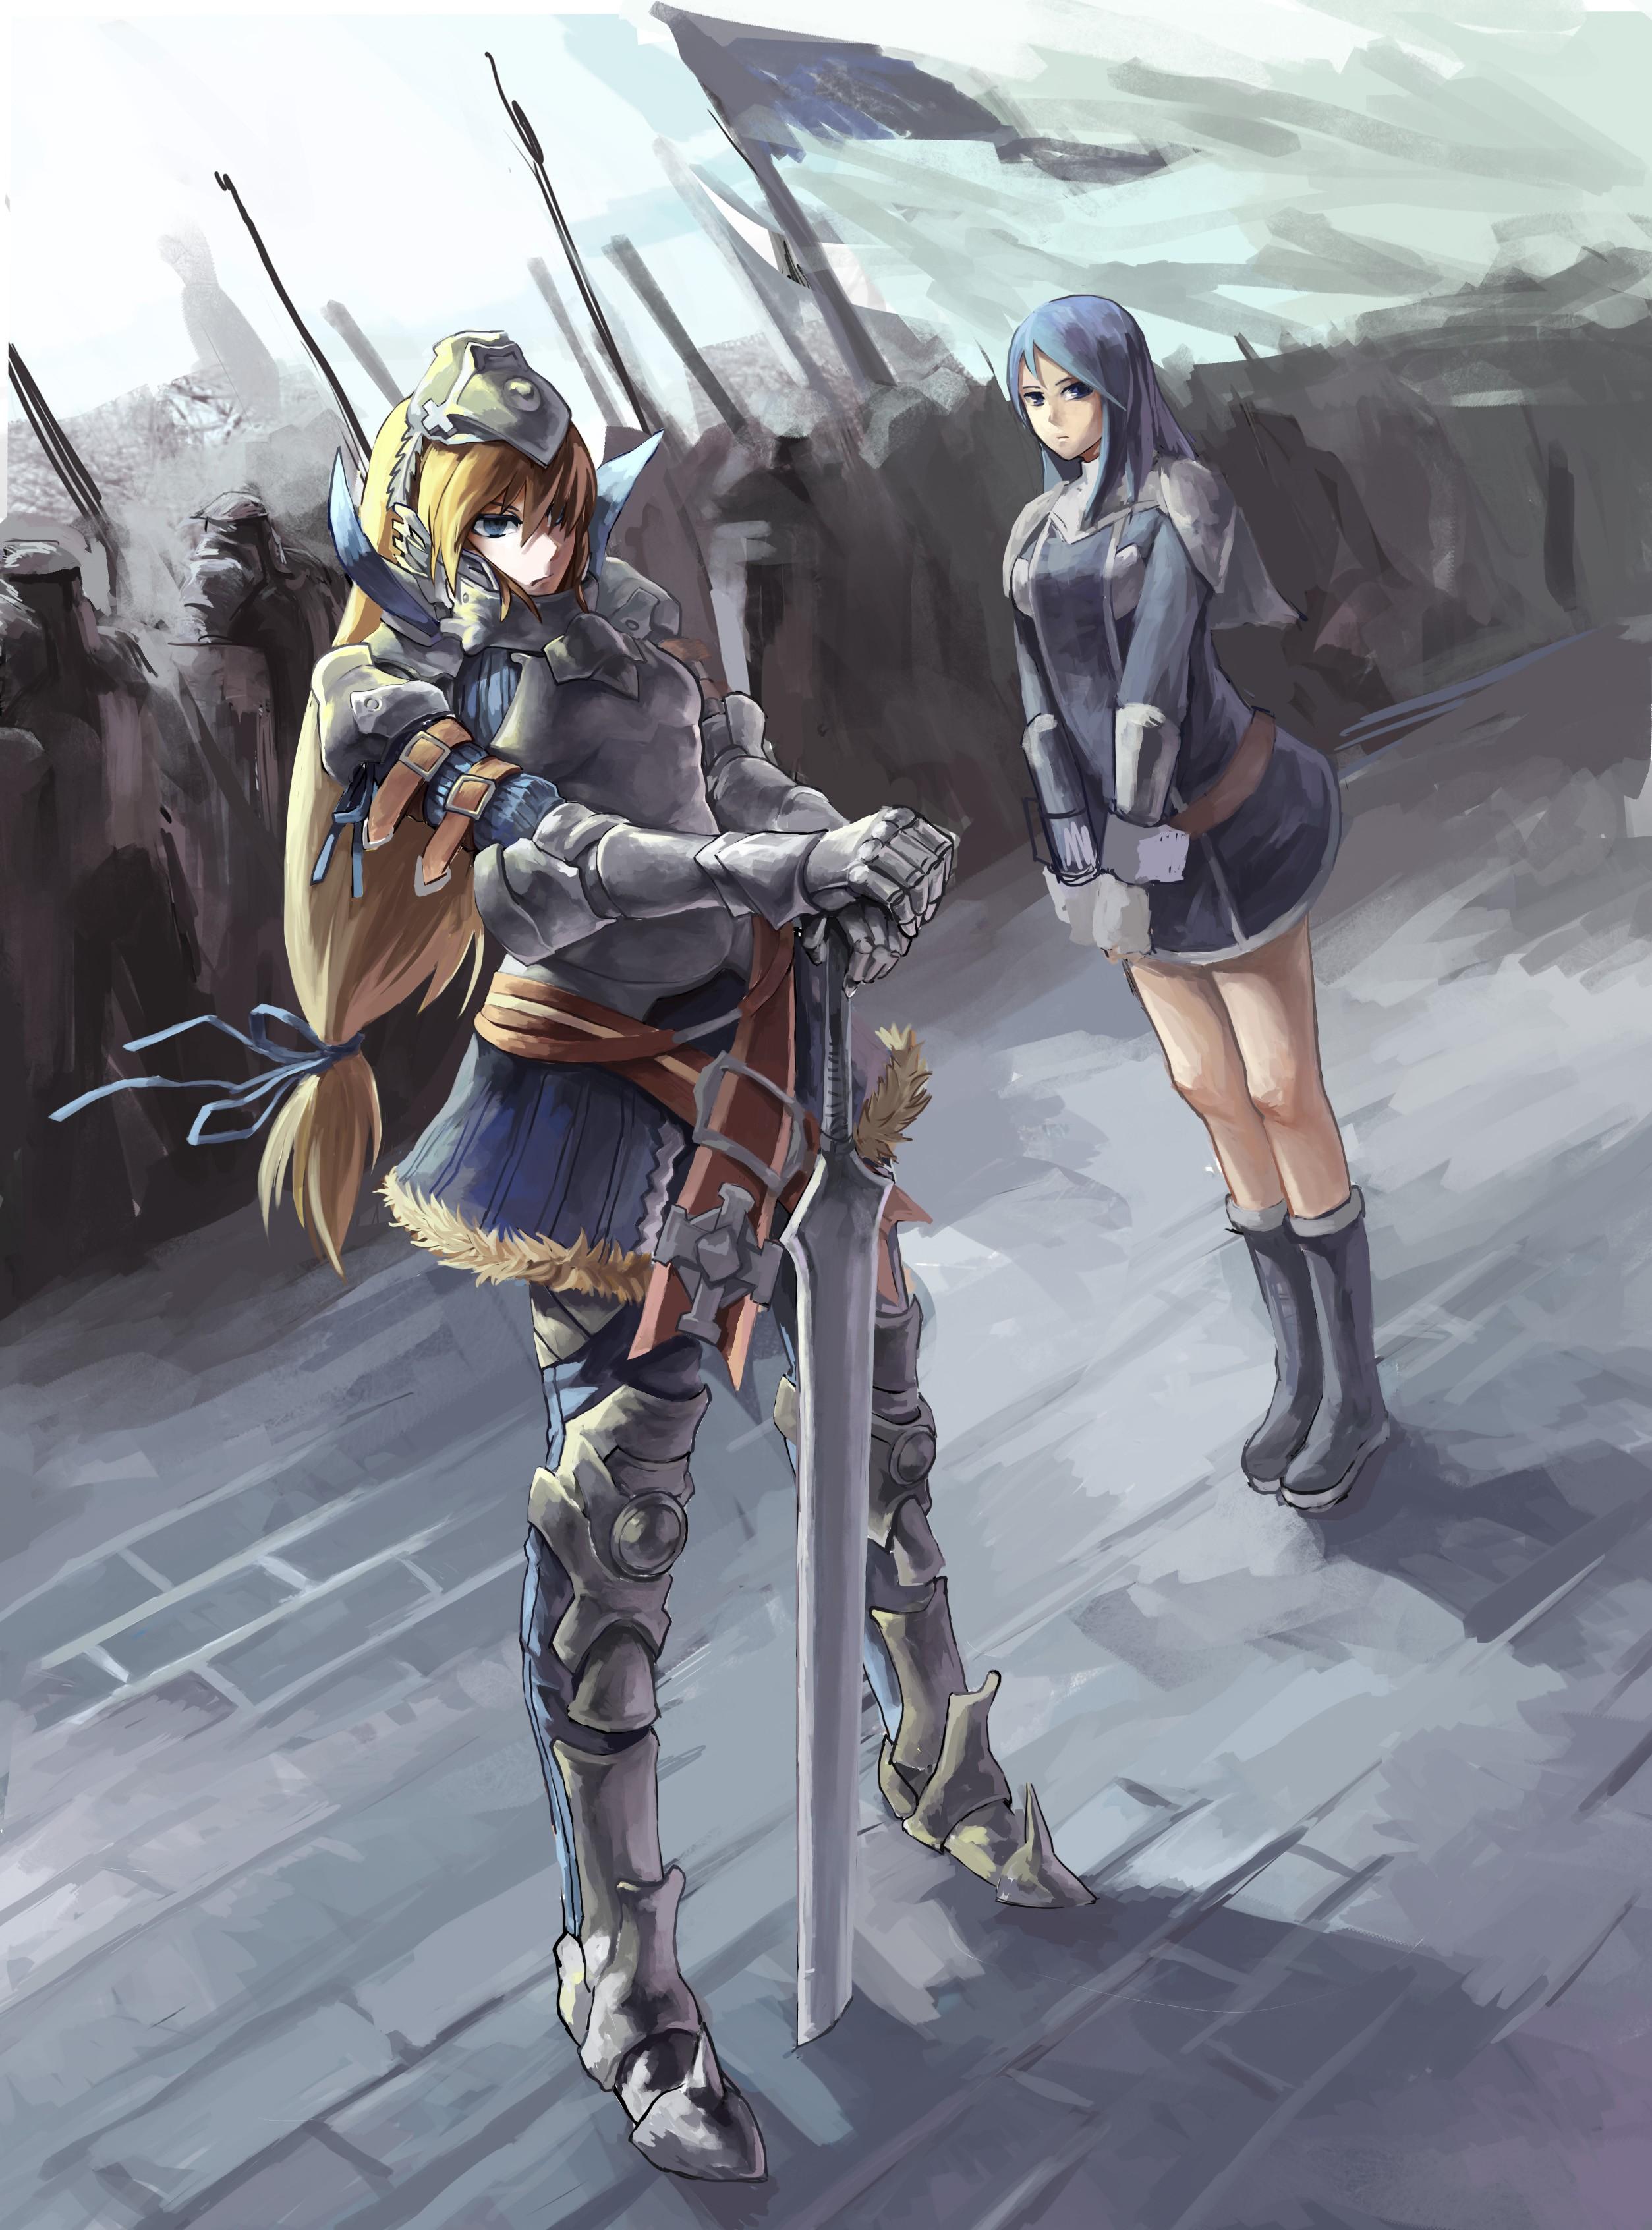 Wallpaper fantasy girl blonde long hair anime girls - Anime girl with weapon ...